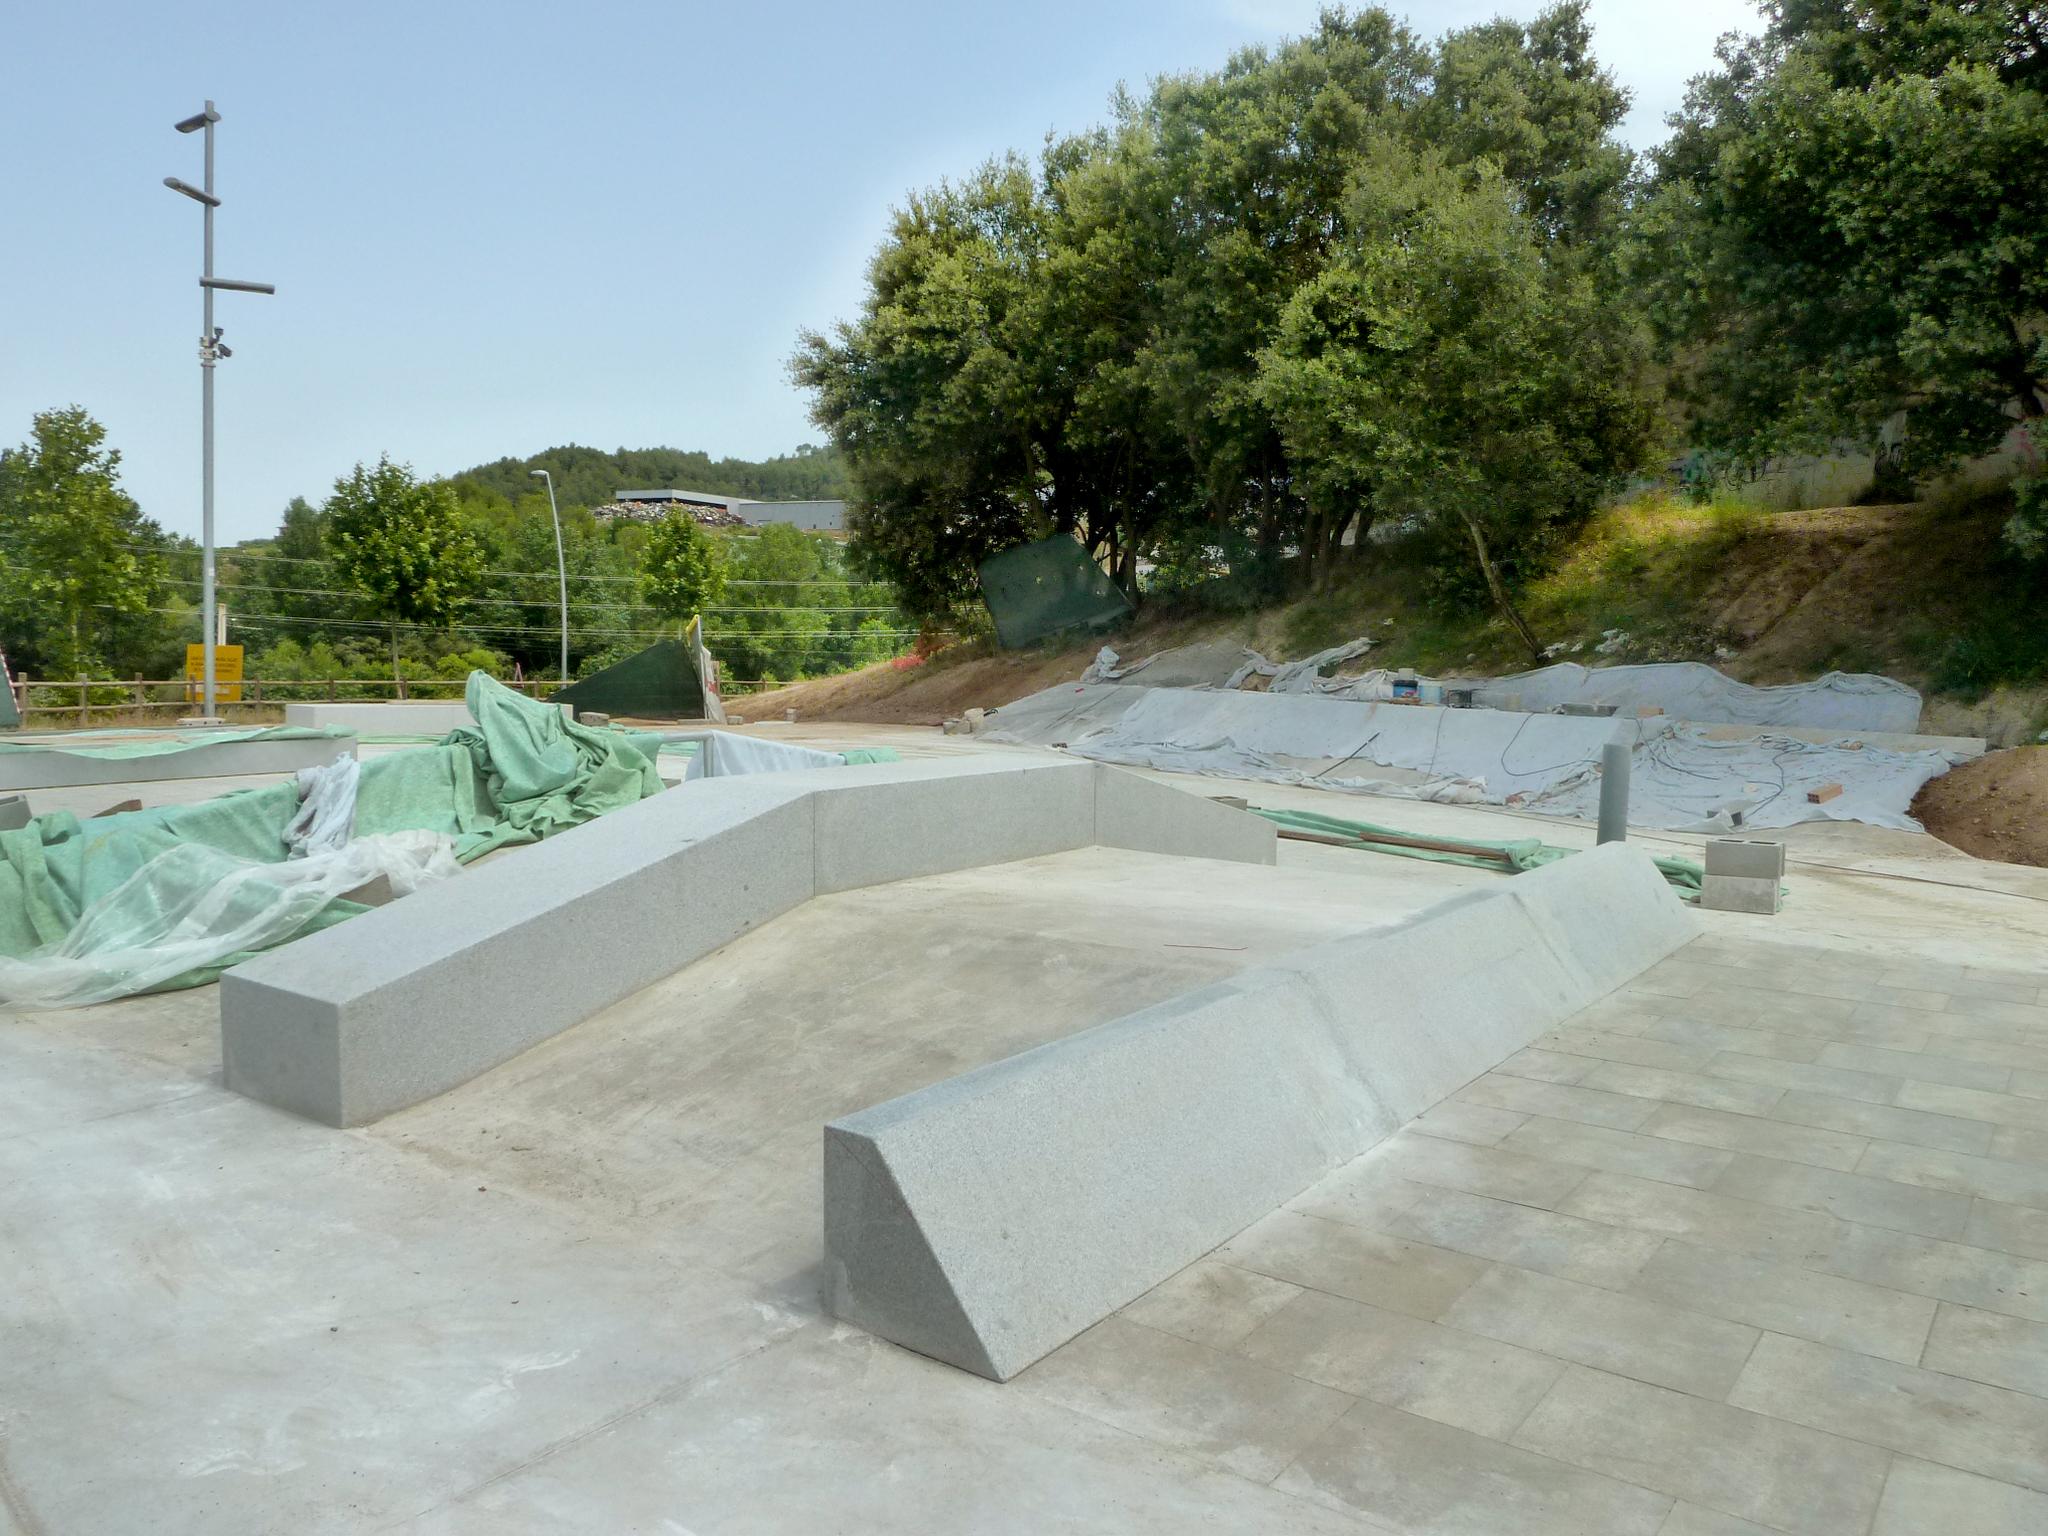 SKATE-ARCHITECTS-EL-PONT-DE-VILOMARA-P1150136.jpg